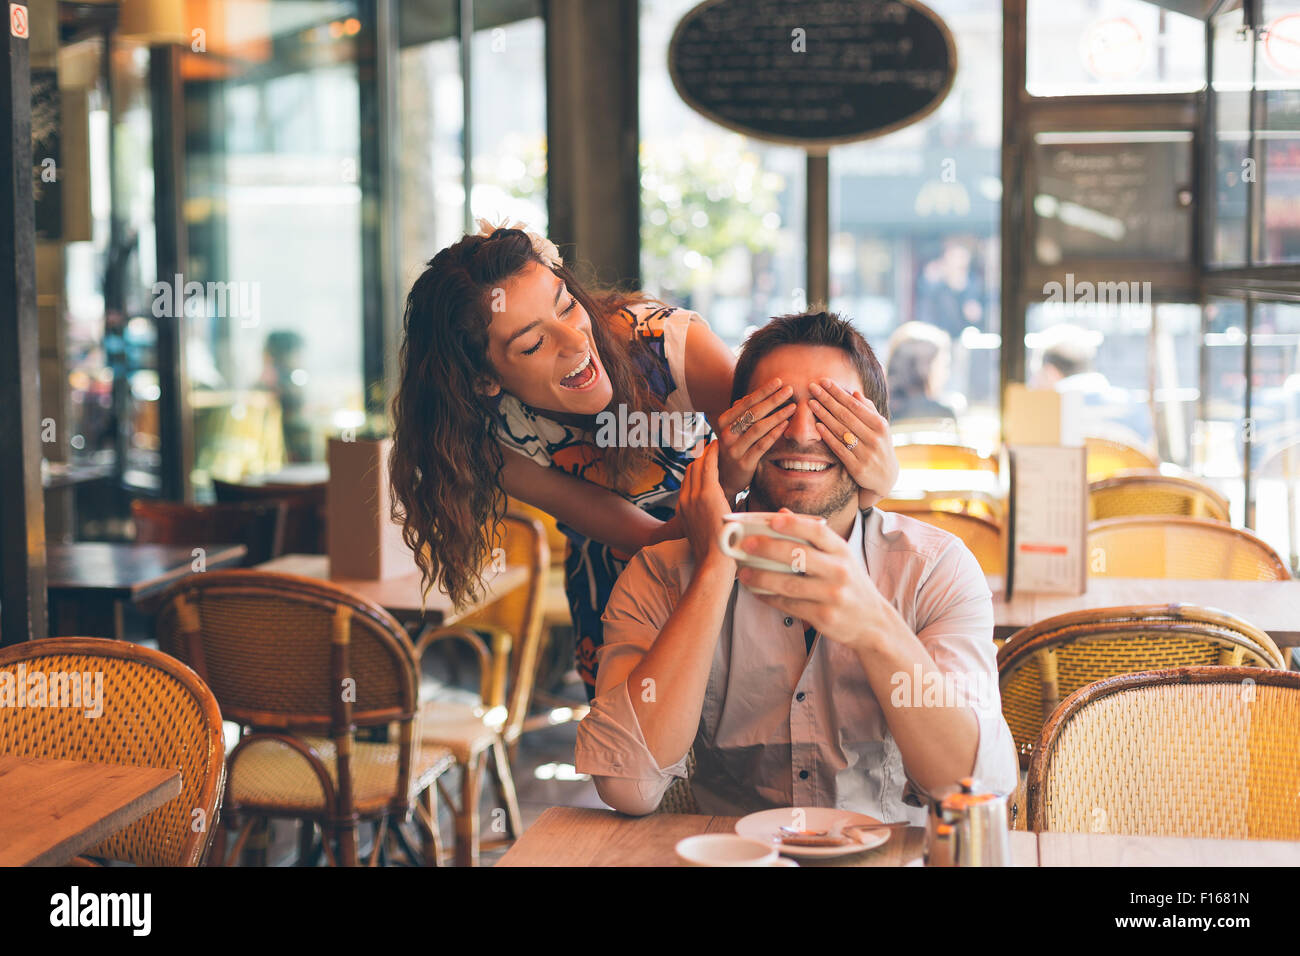 Paar Partnersuche in Cafe, Paris Stockbild